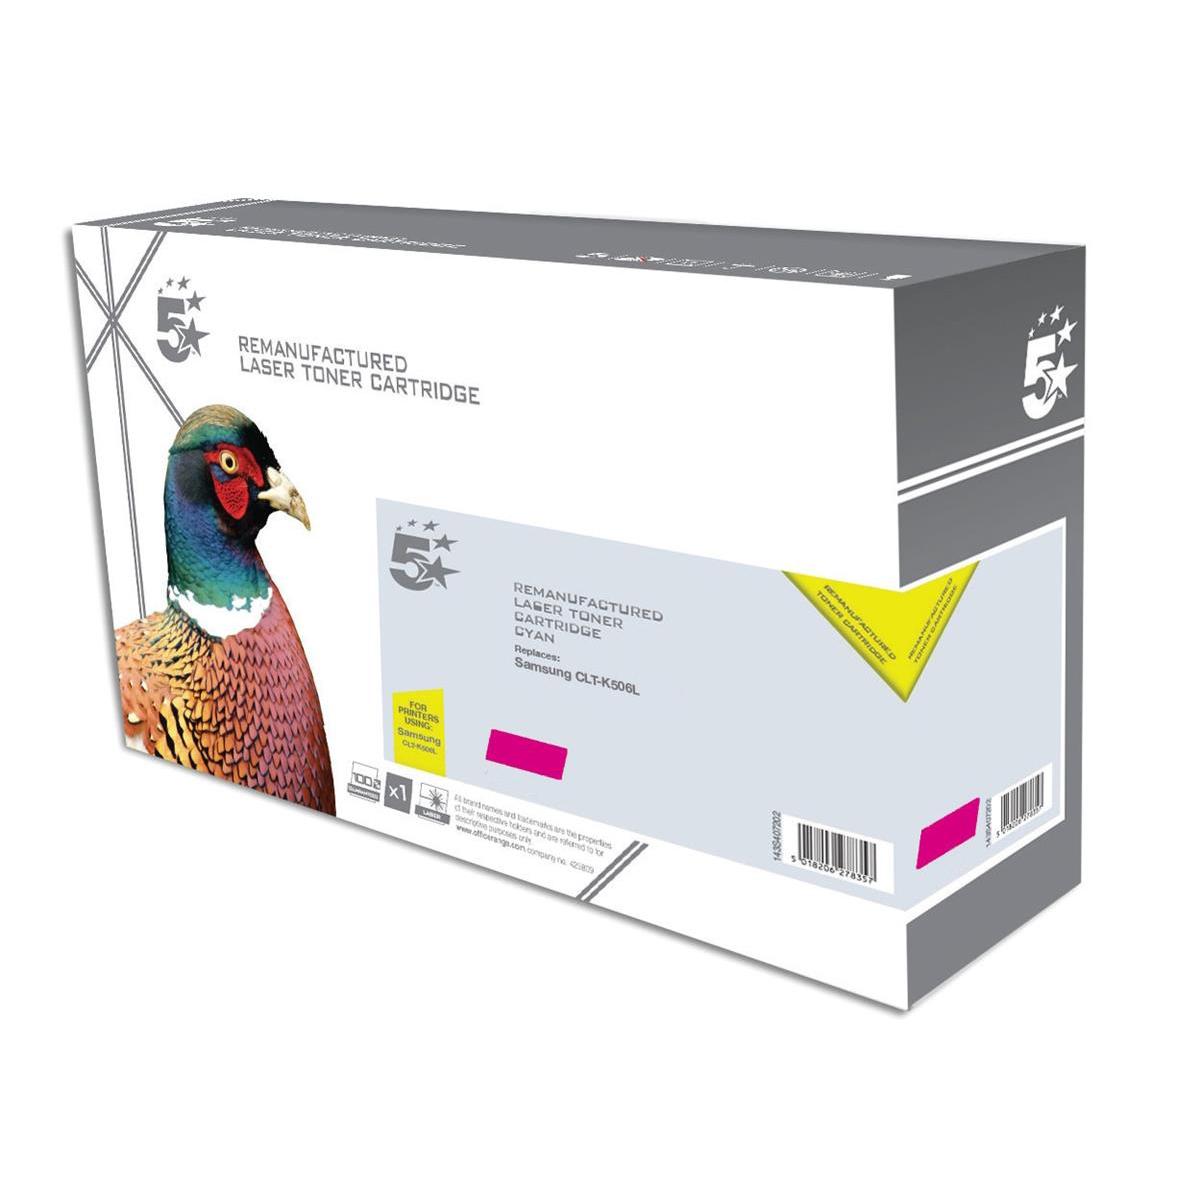 Image for 5 Star Office Reman Laser Toner Cart High Yield 3500pp Magenta [Samsung CLT-M506L SU309A Alternative]